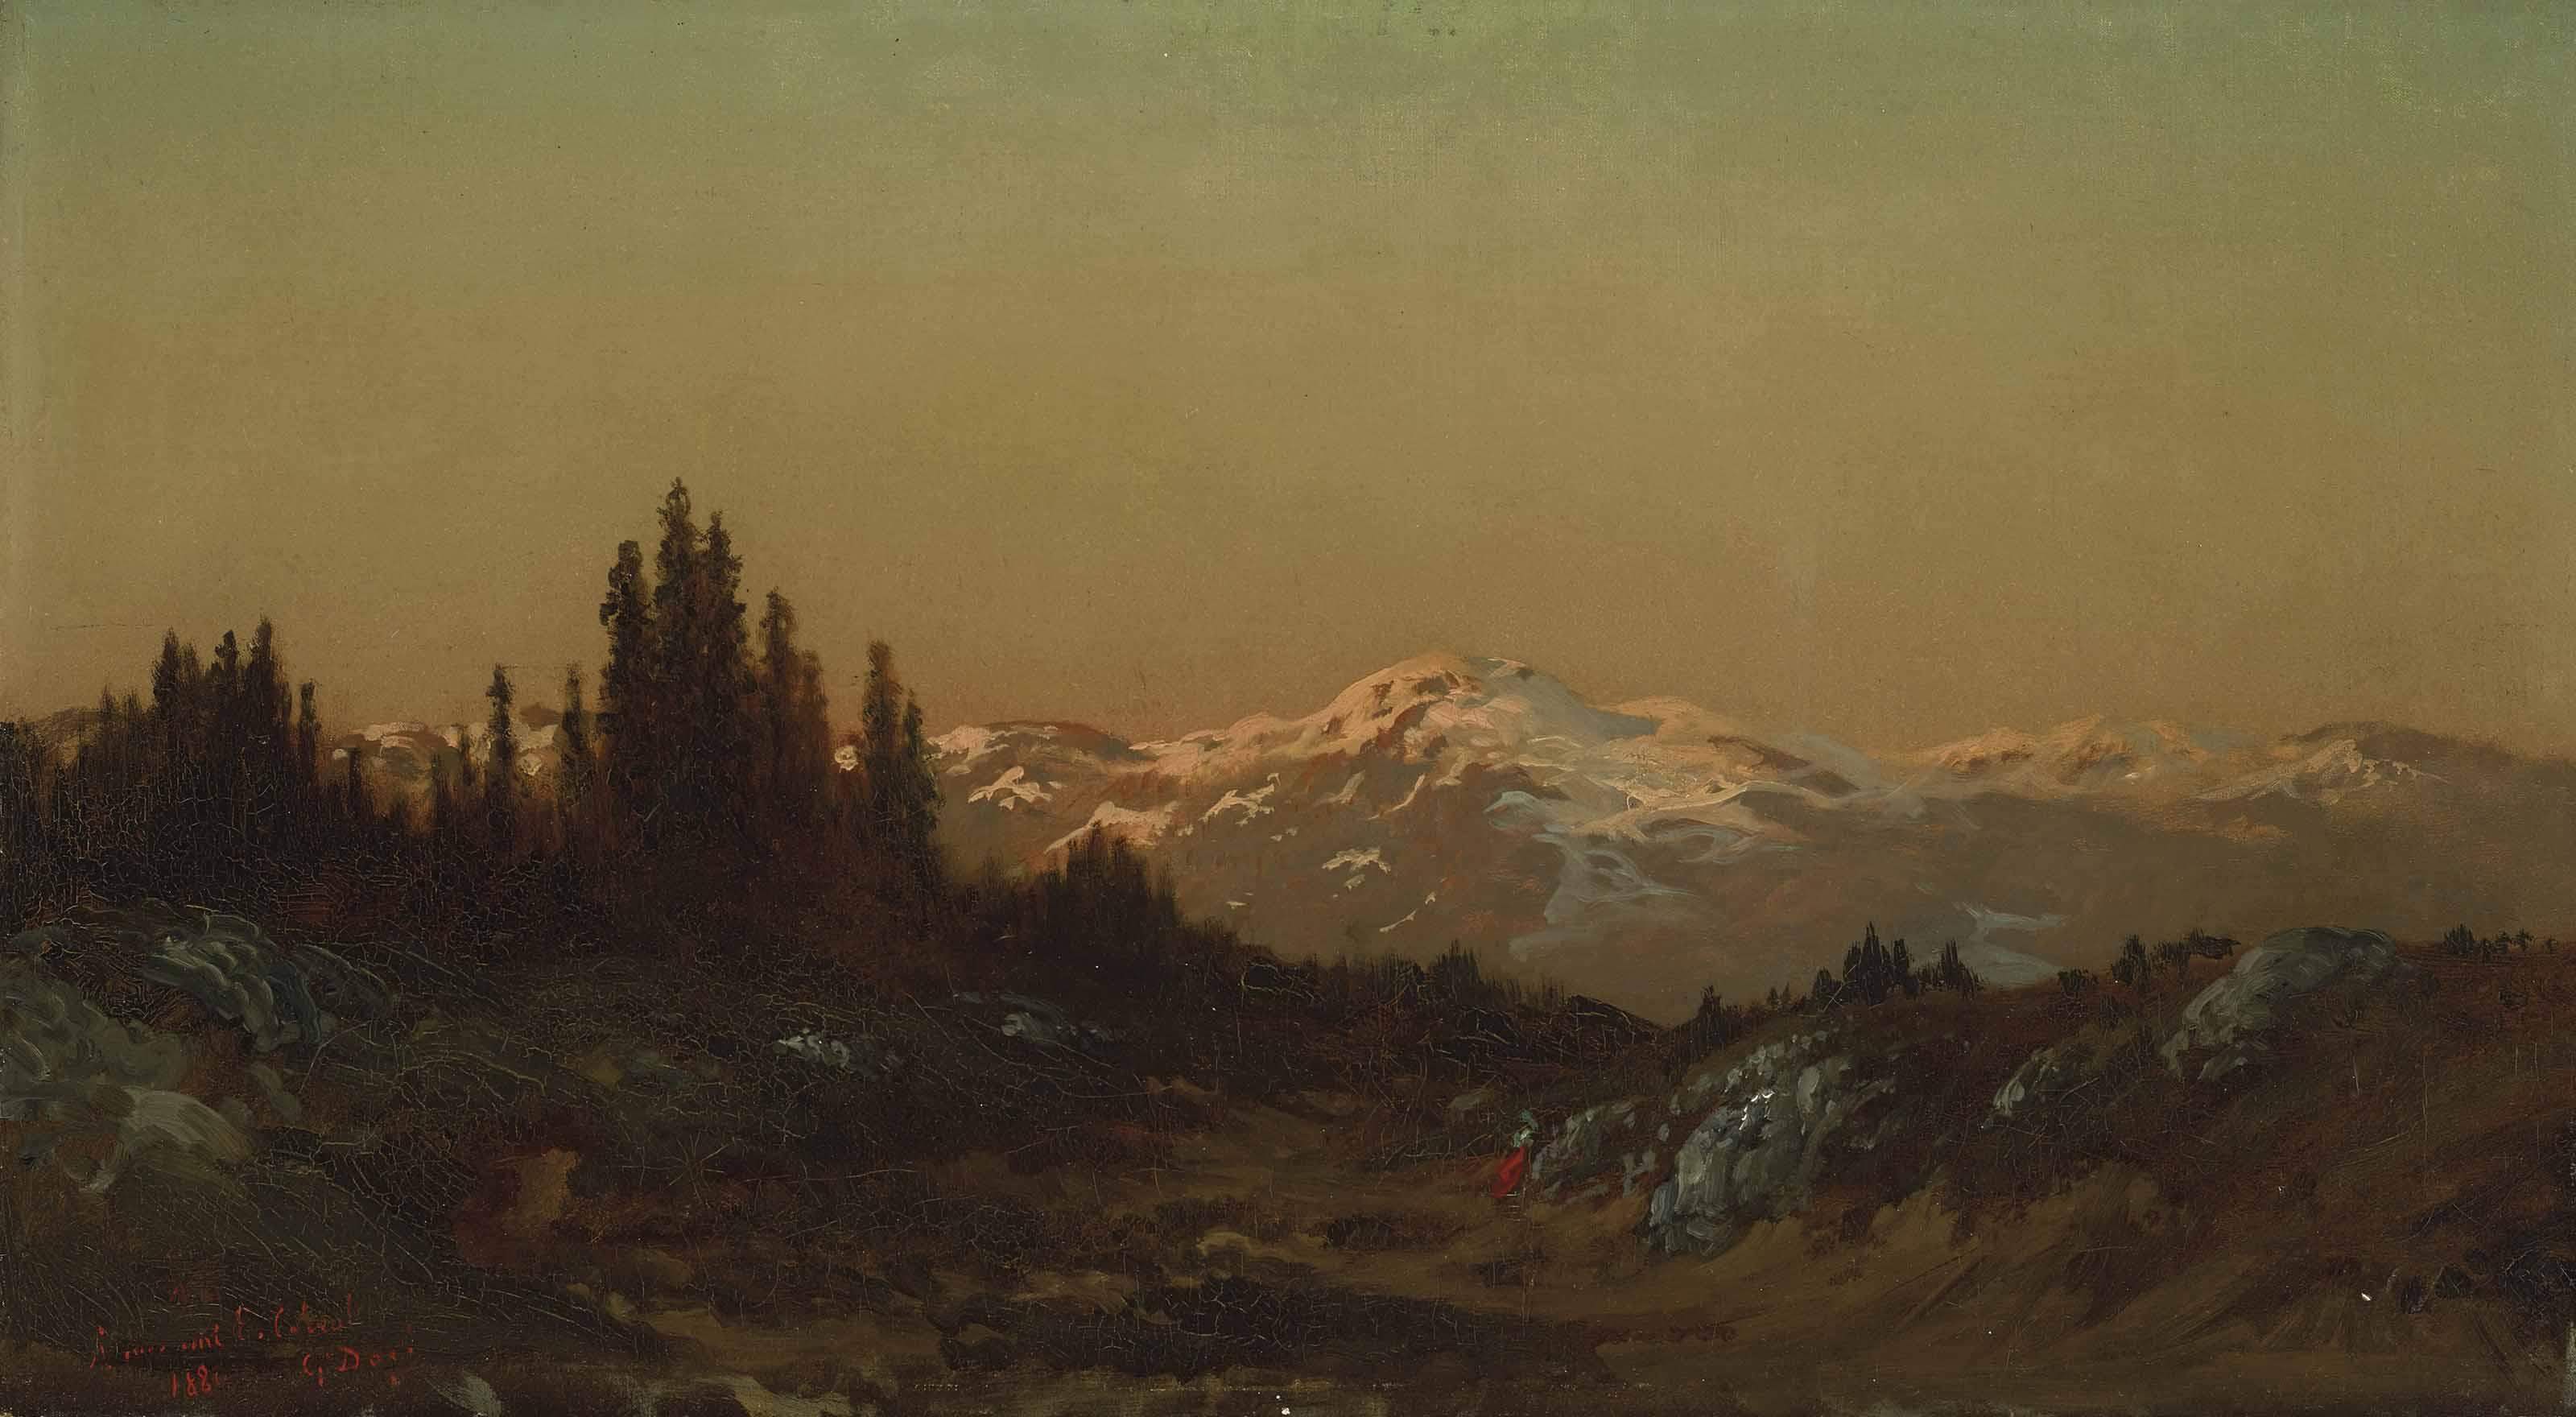 GUSTAVE DORÉ (STRASBOURG 1832-